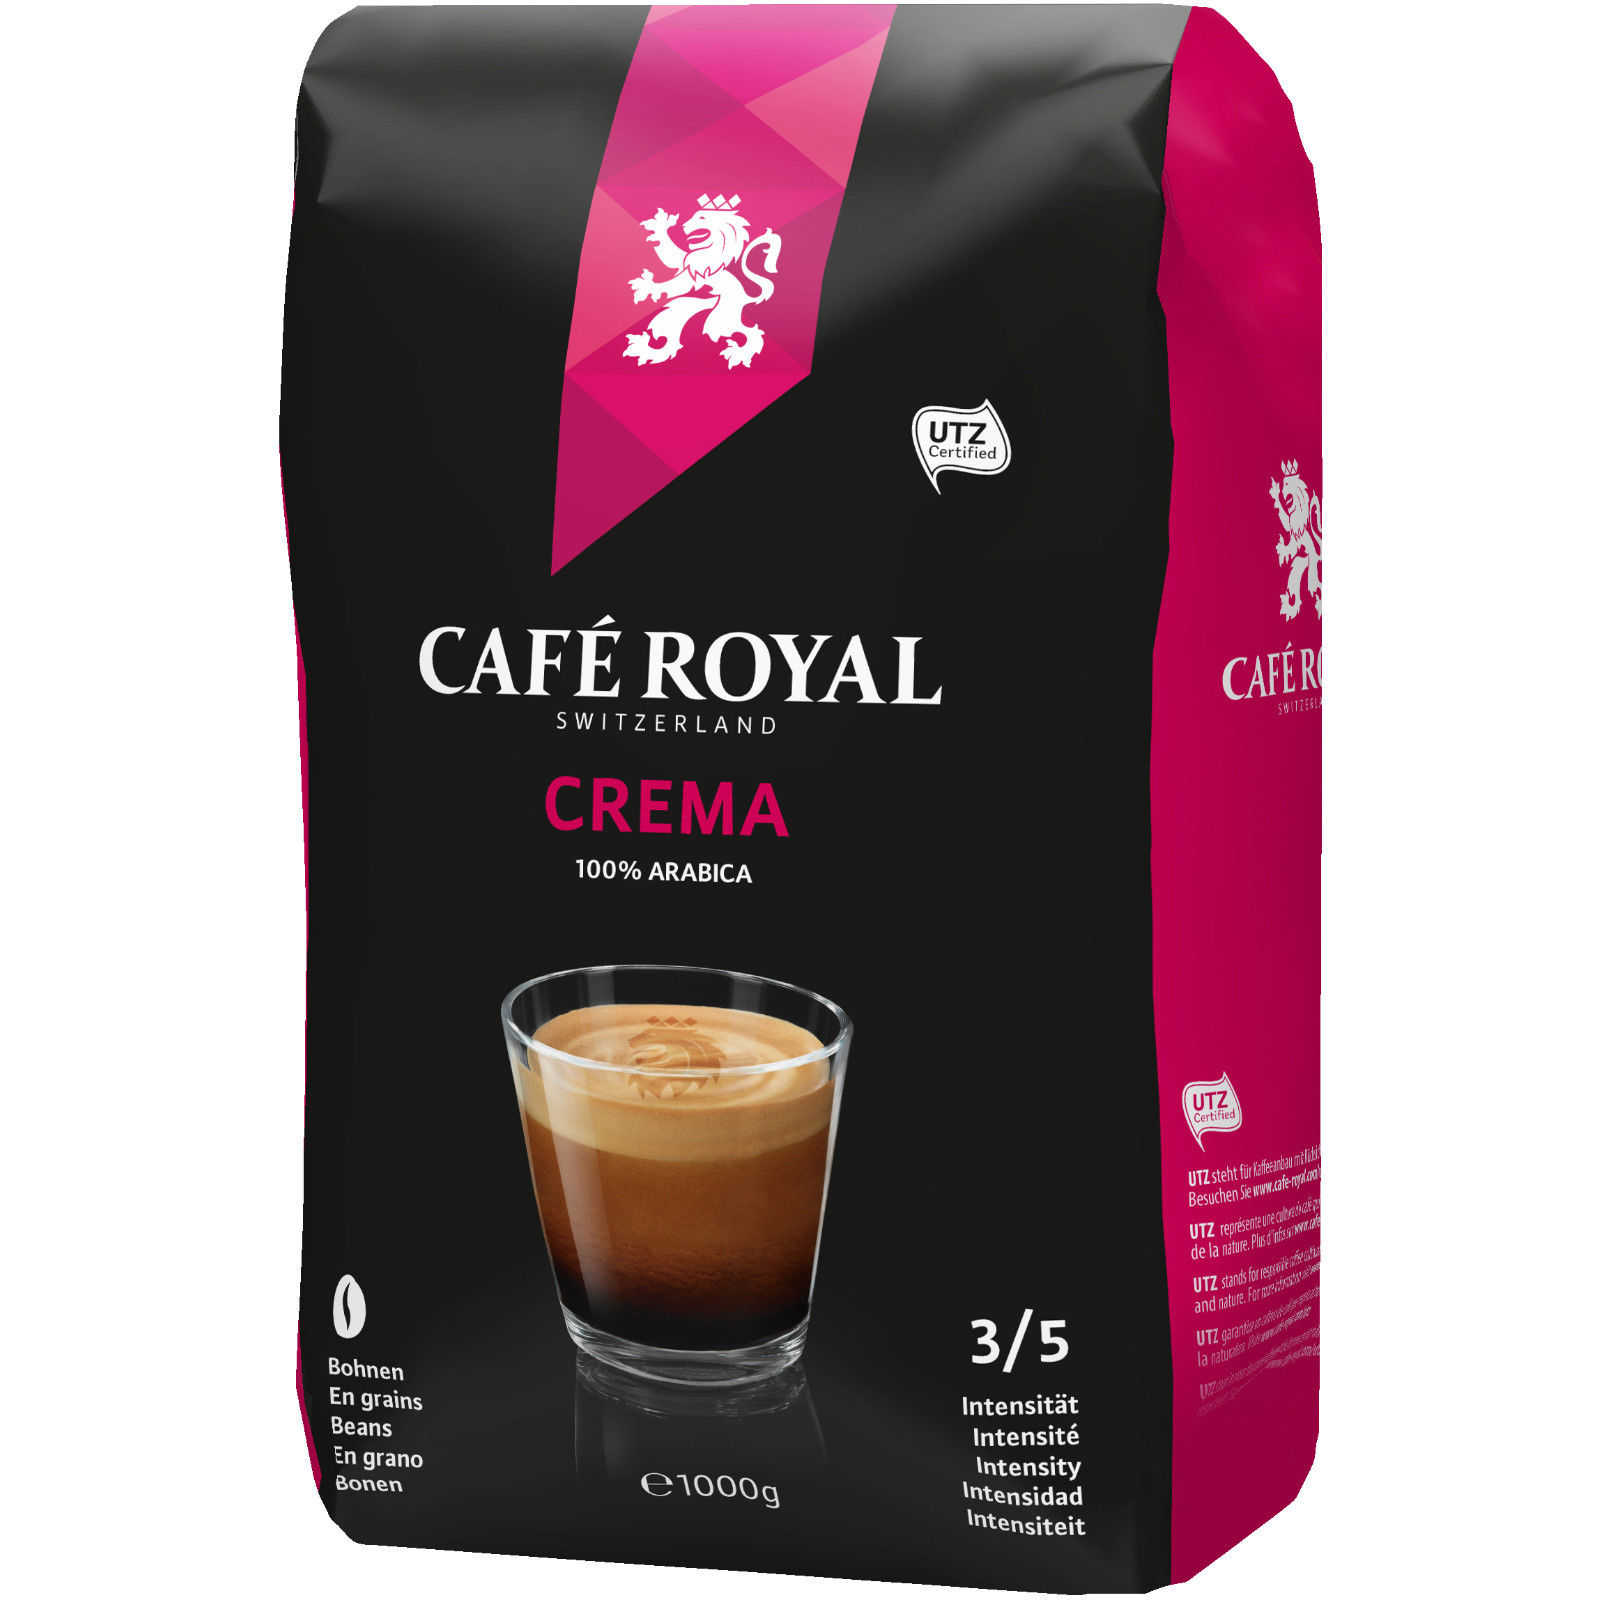 caf royal crema bohnenkaffee 1kg fuer 777e inkl versand statt 1396e